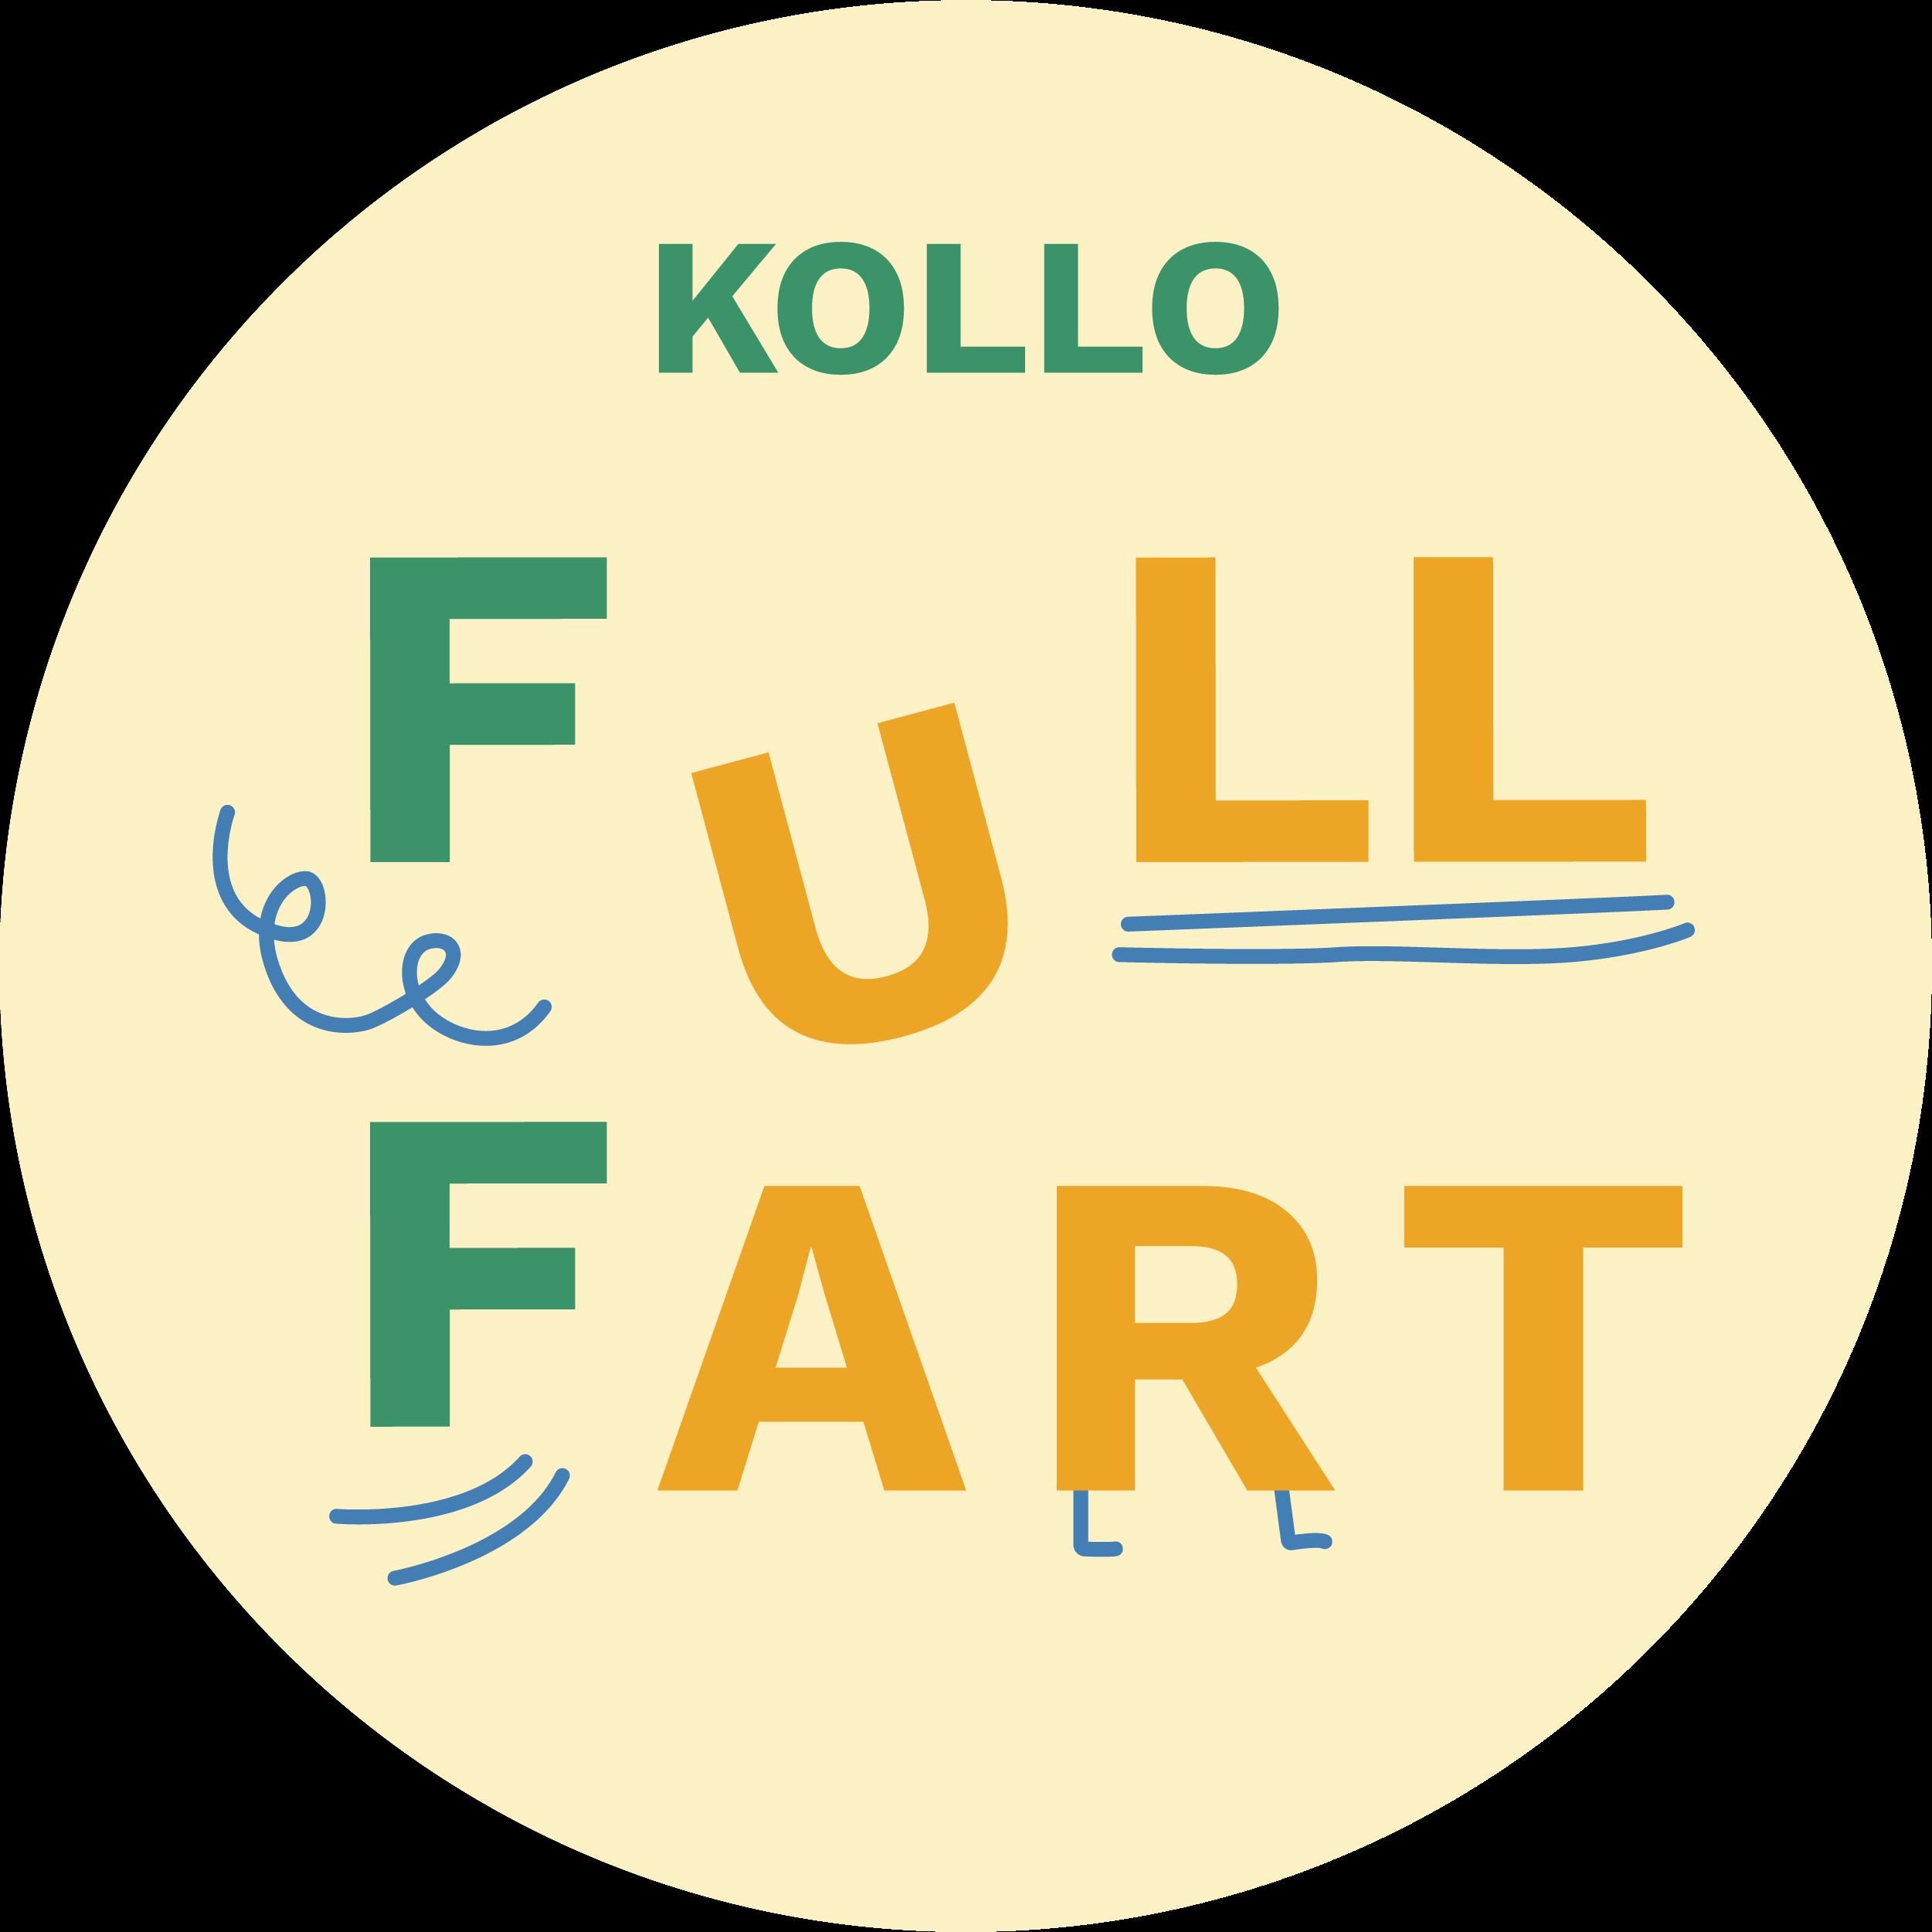 Kollo Full Fart